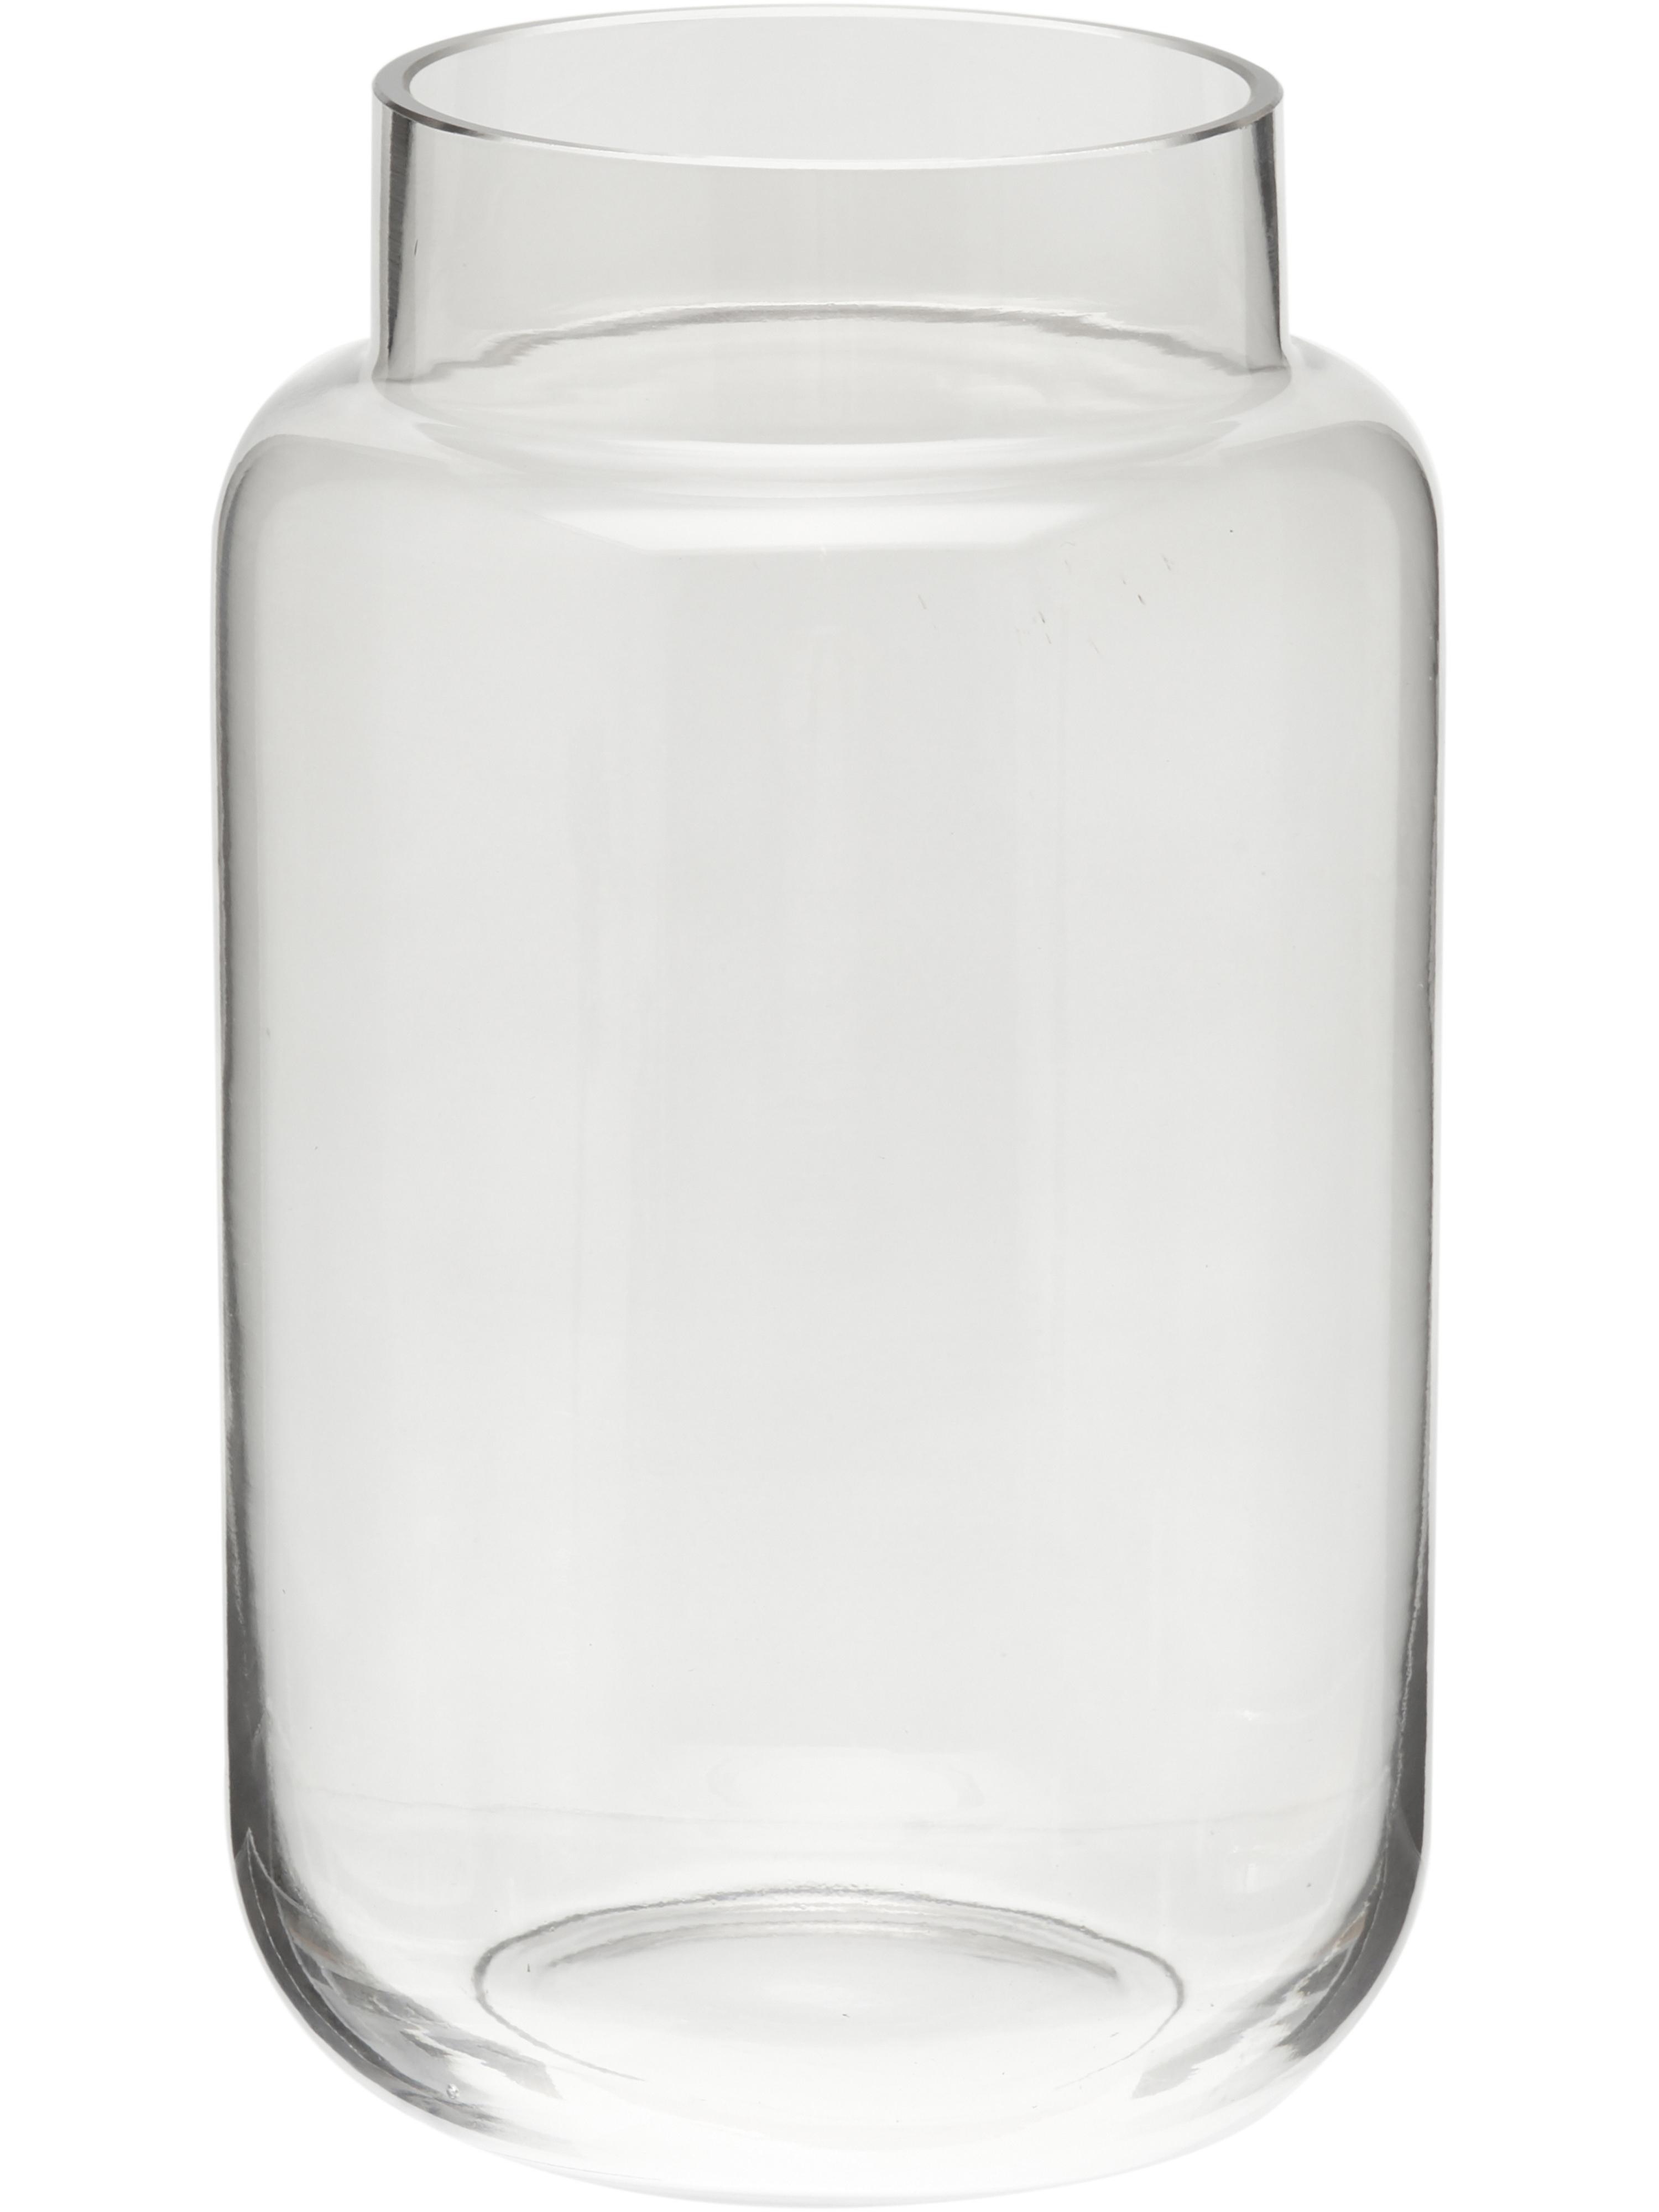 Jarrón grande de vidrio Lasse, Vidrio, Gris, transparente, Ø 14 x Al 23 cm